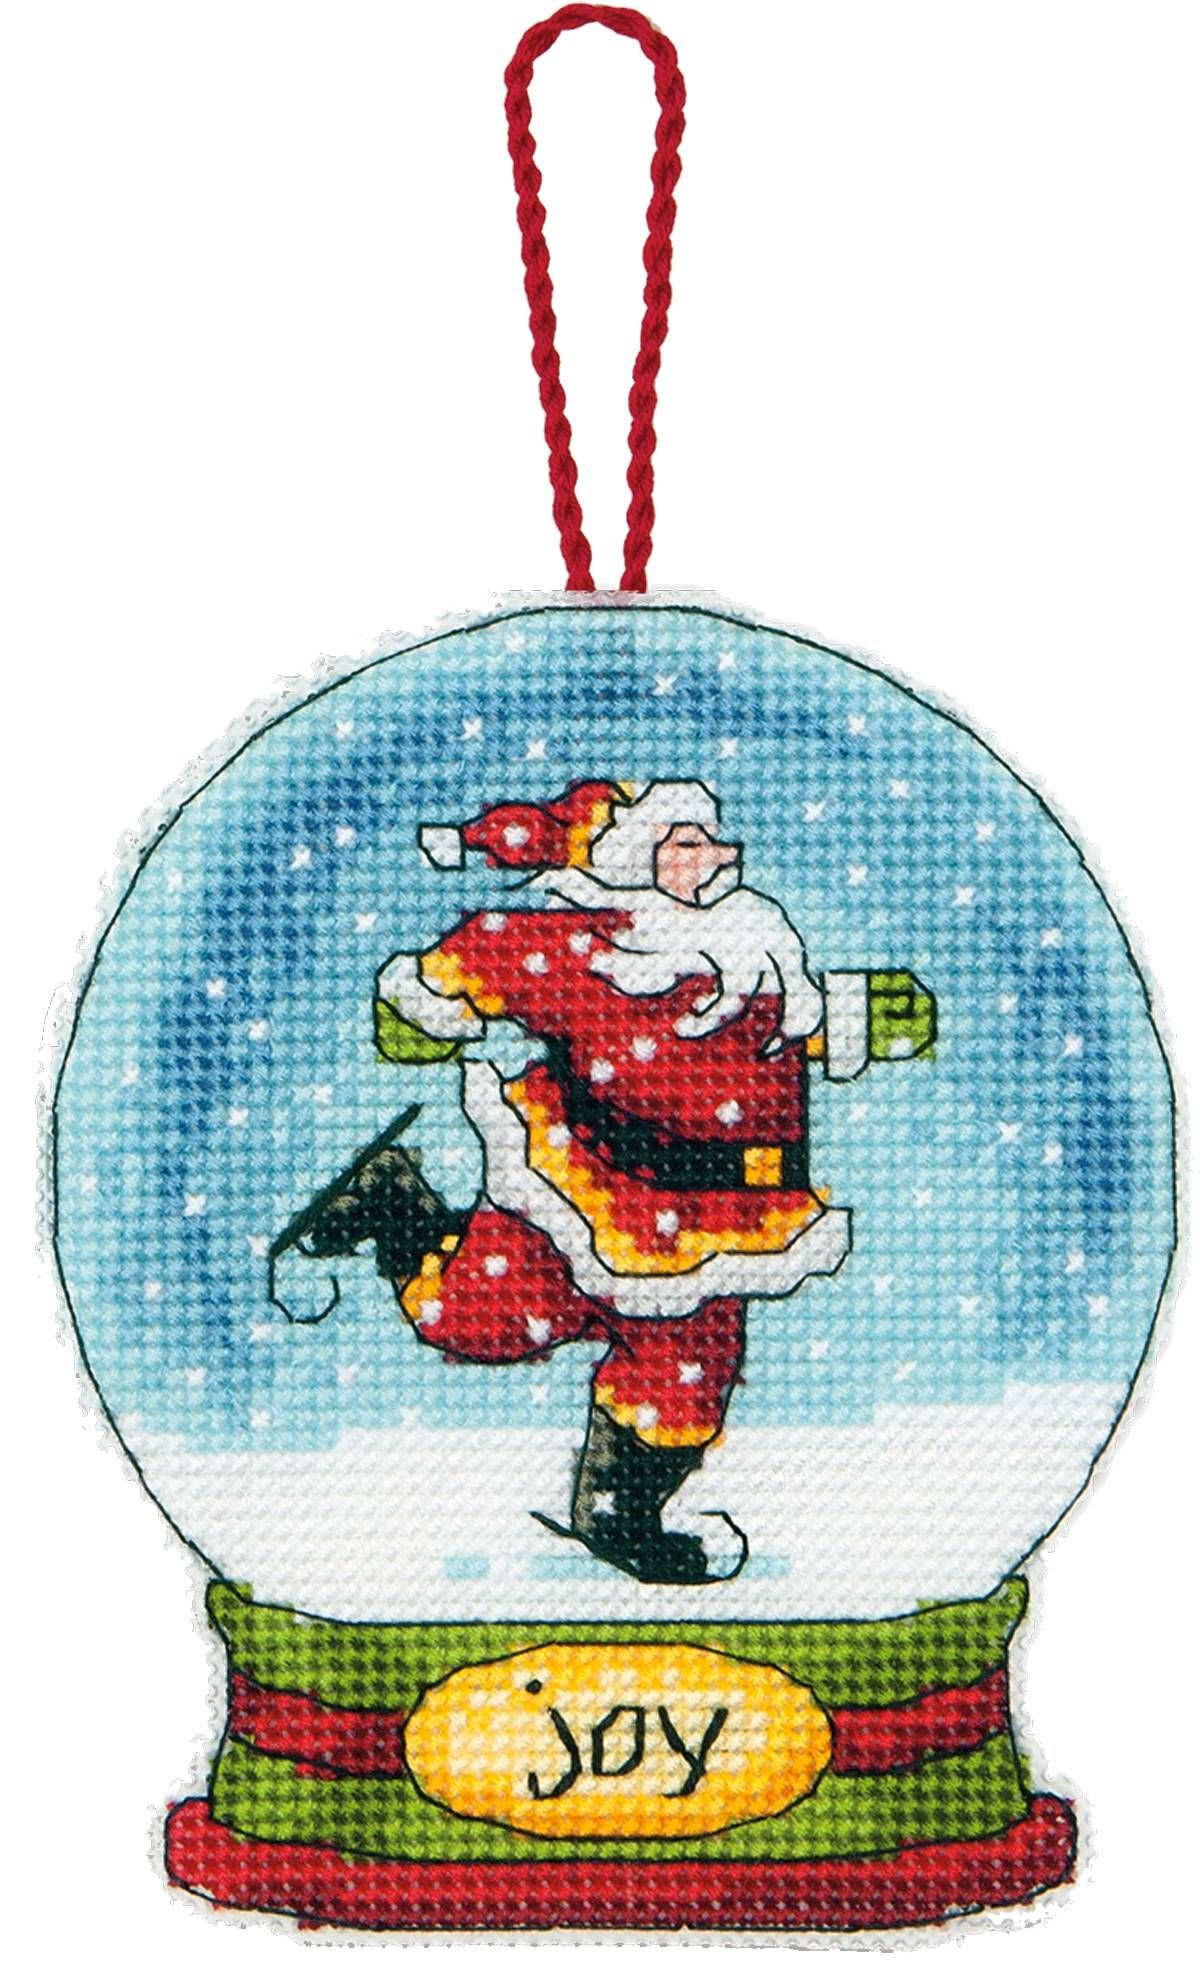 Joy Snow Globe Cross Stitch Ornament Kit Cross stitch